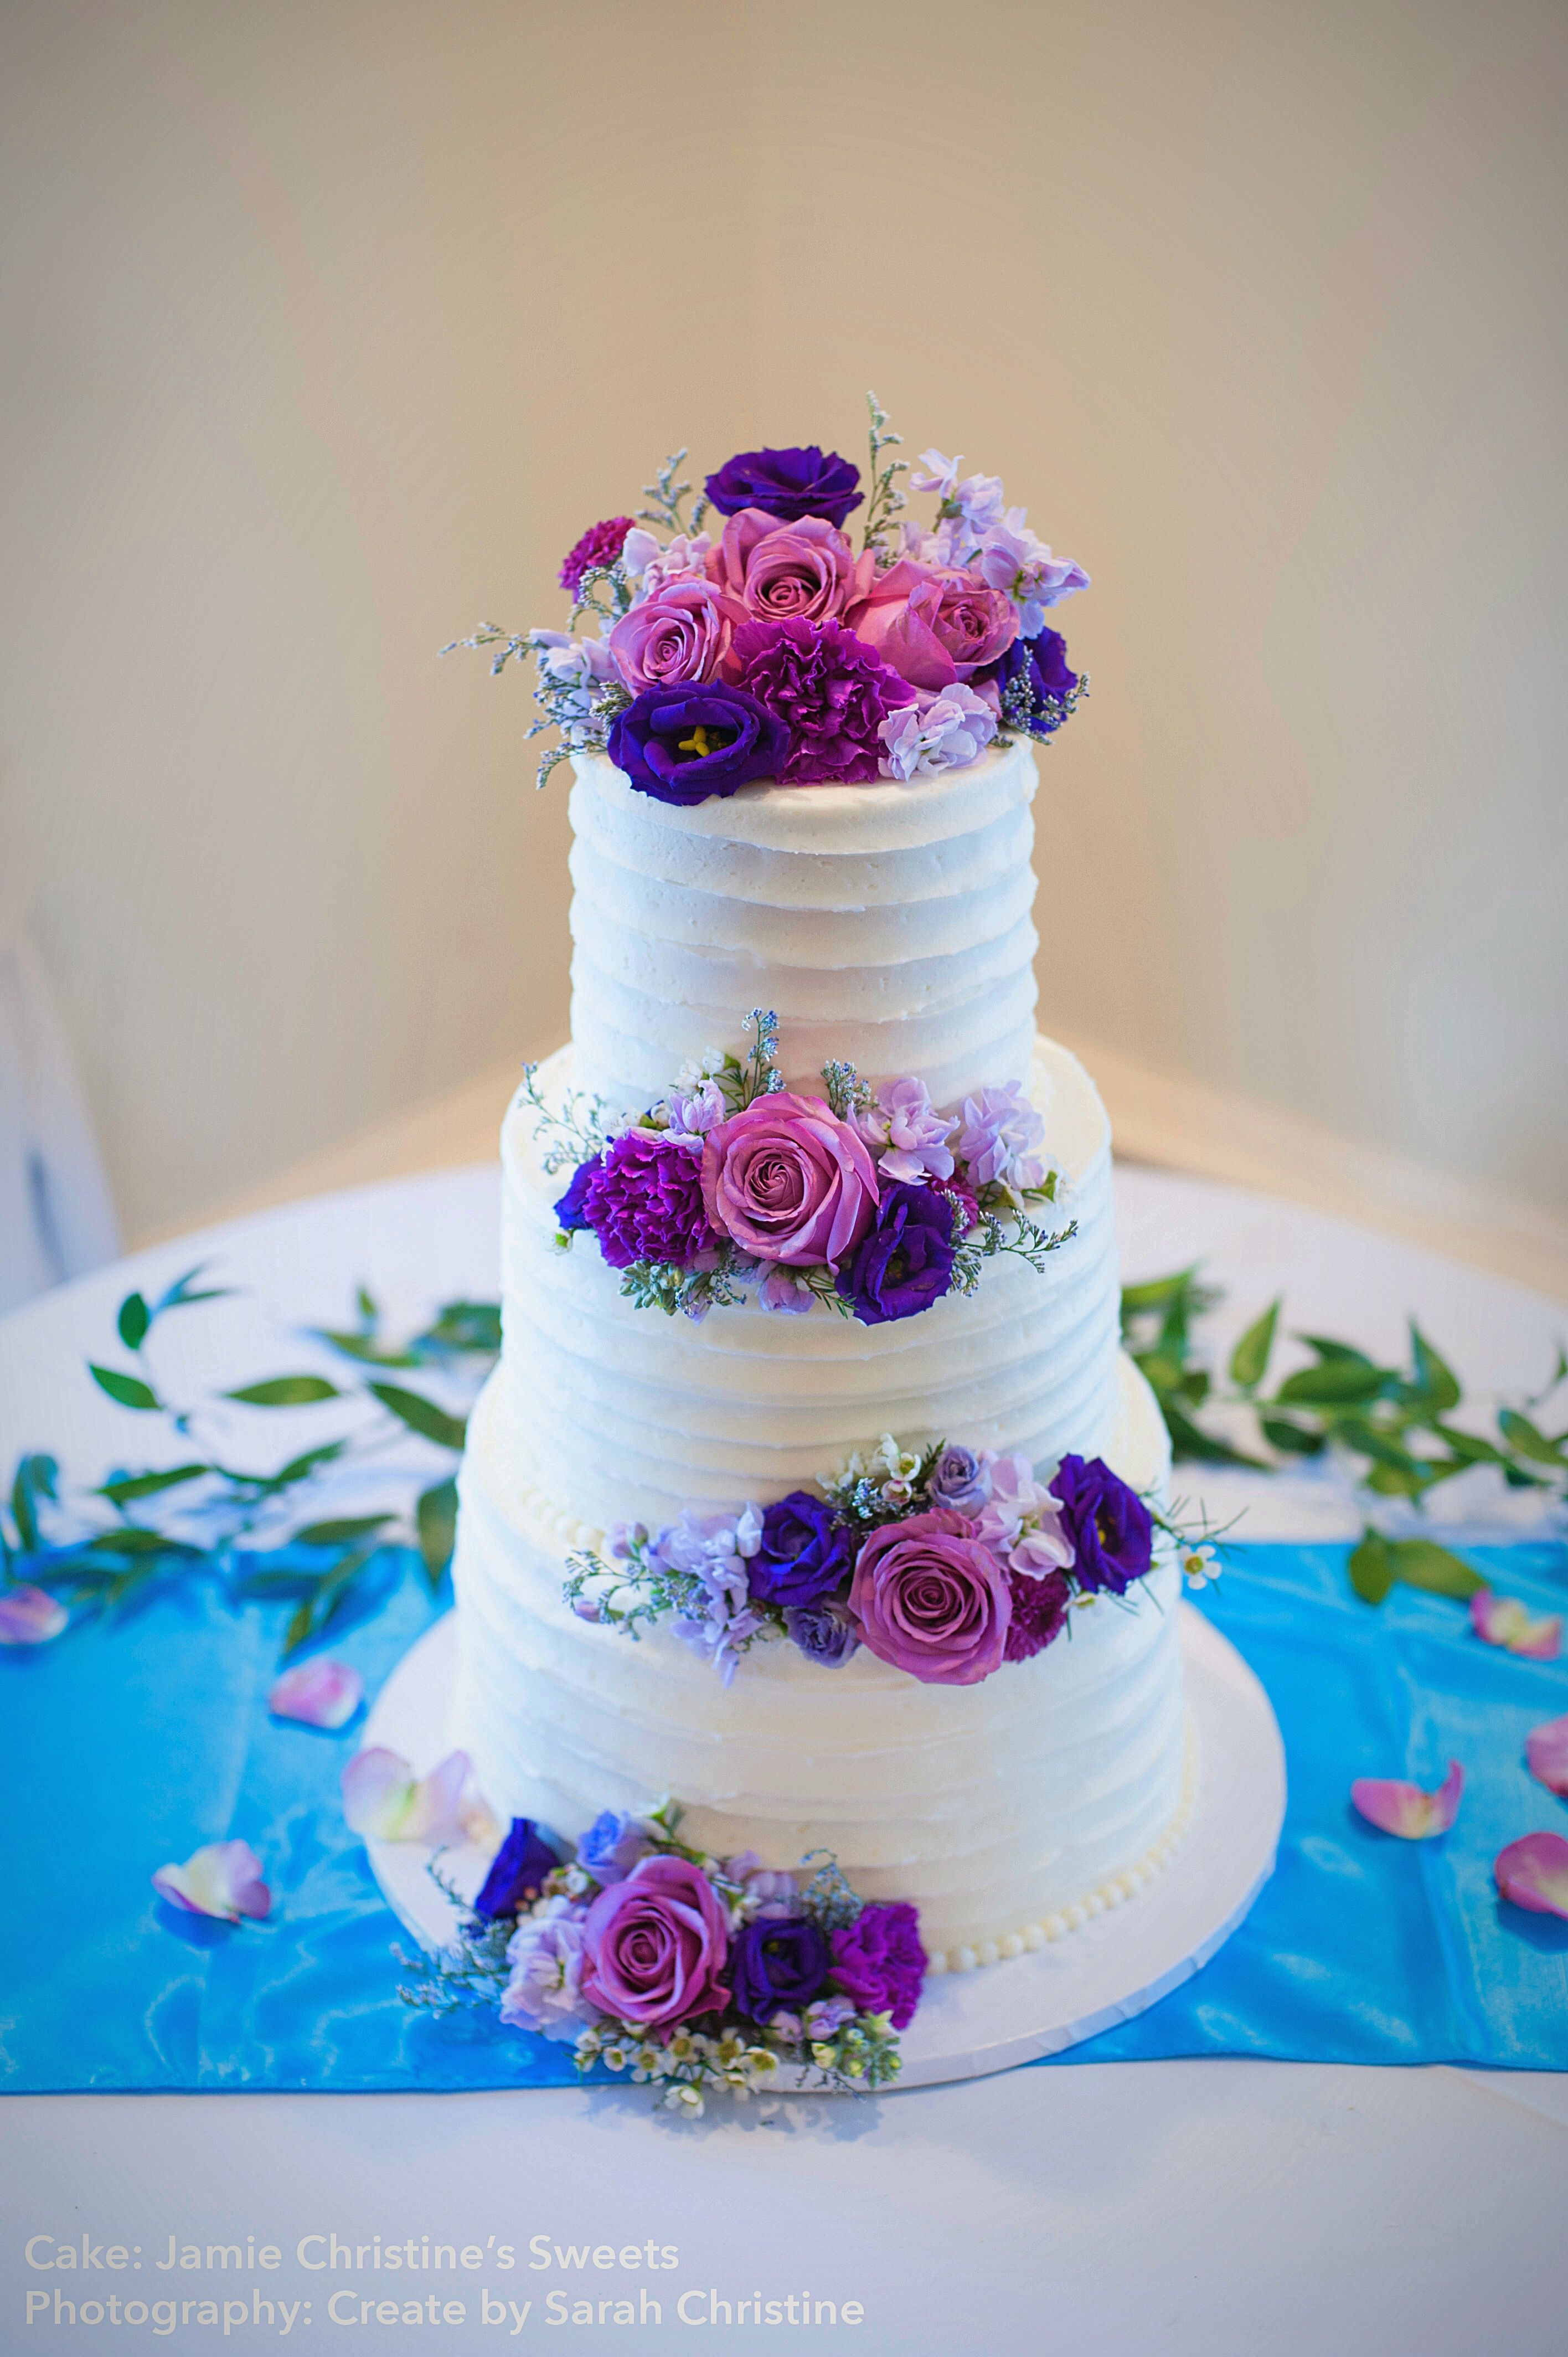 Wedding Cake Simple Elegant Purple Flowers 3 Tier White